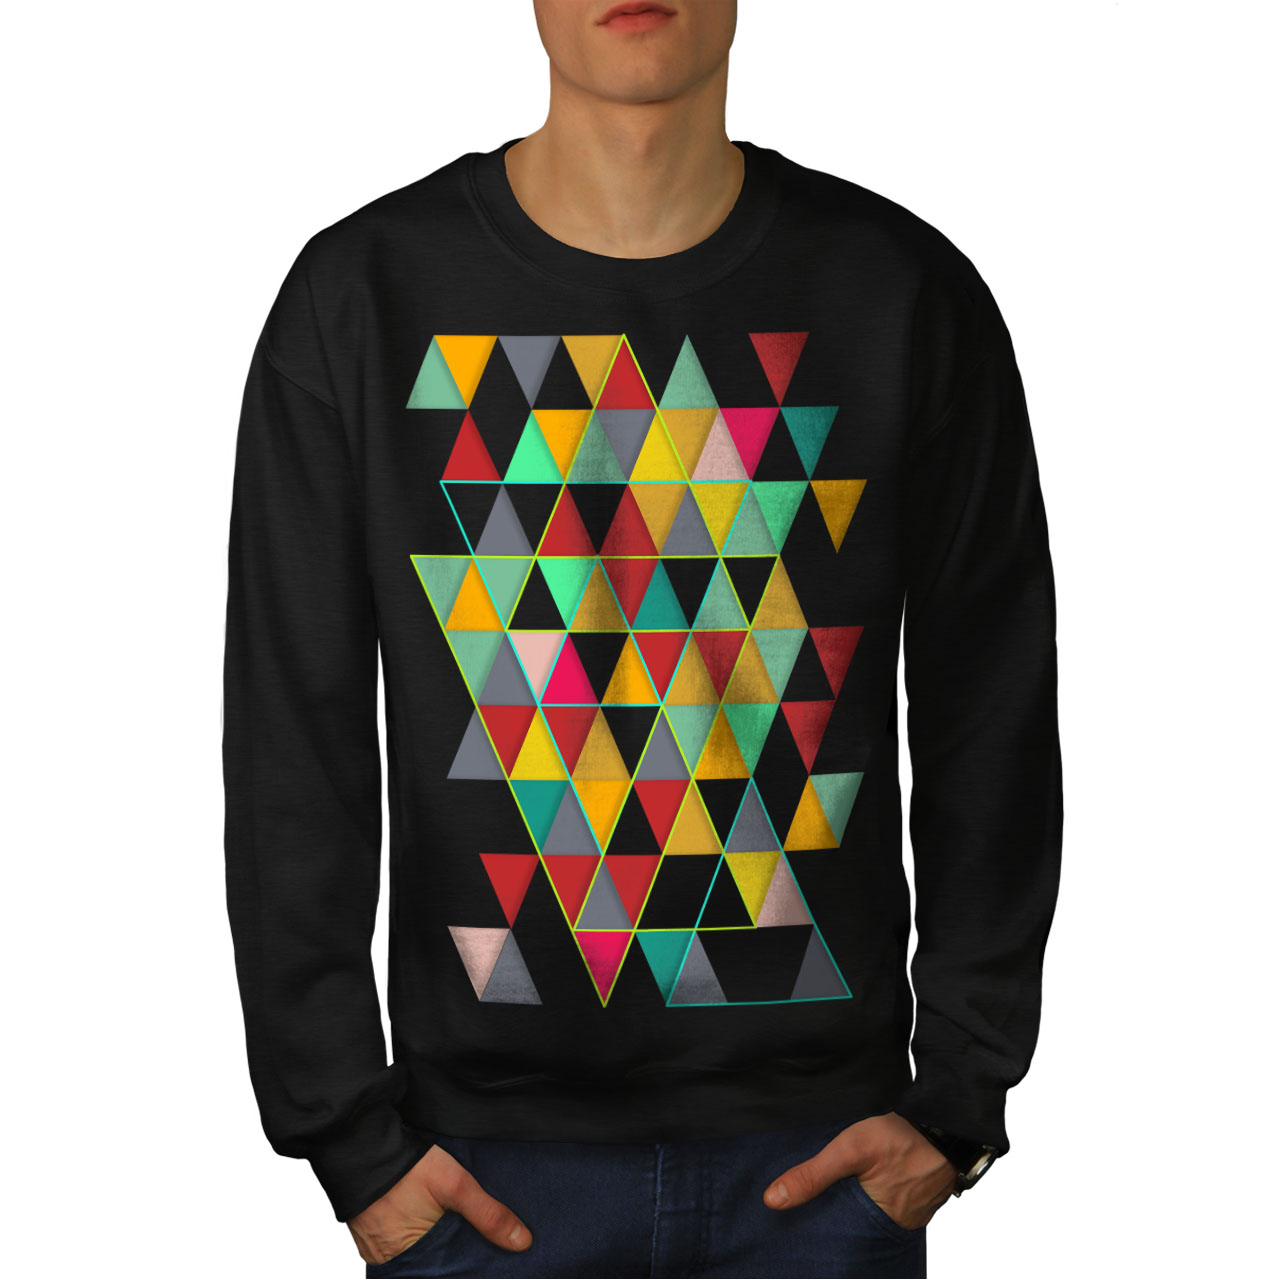 Wellcoda Geometric Stylish Womens Sweatshirt Abstract Casual Pullover Jumper